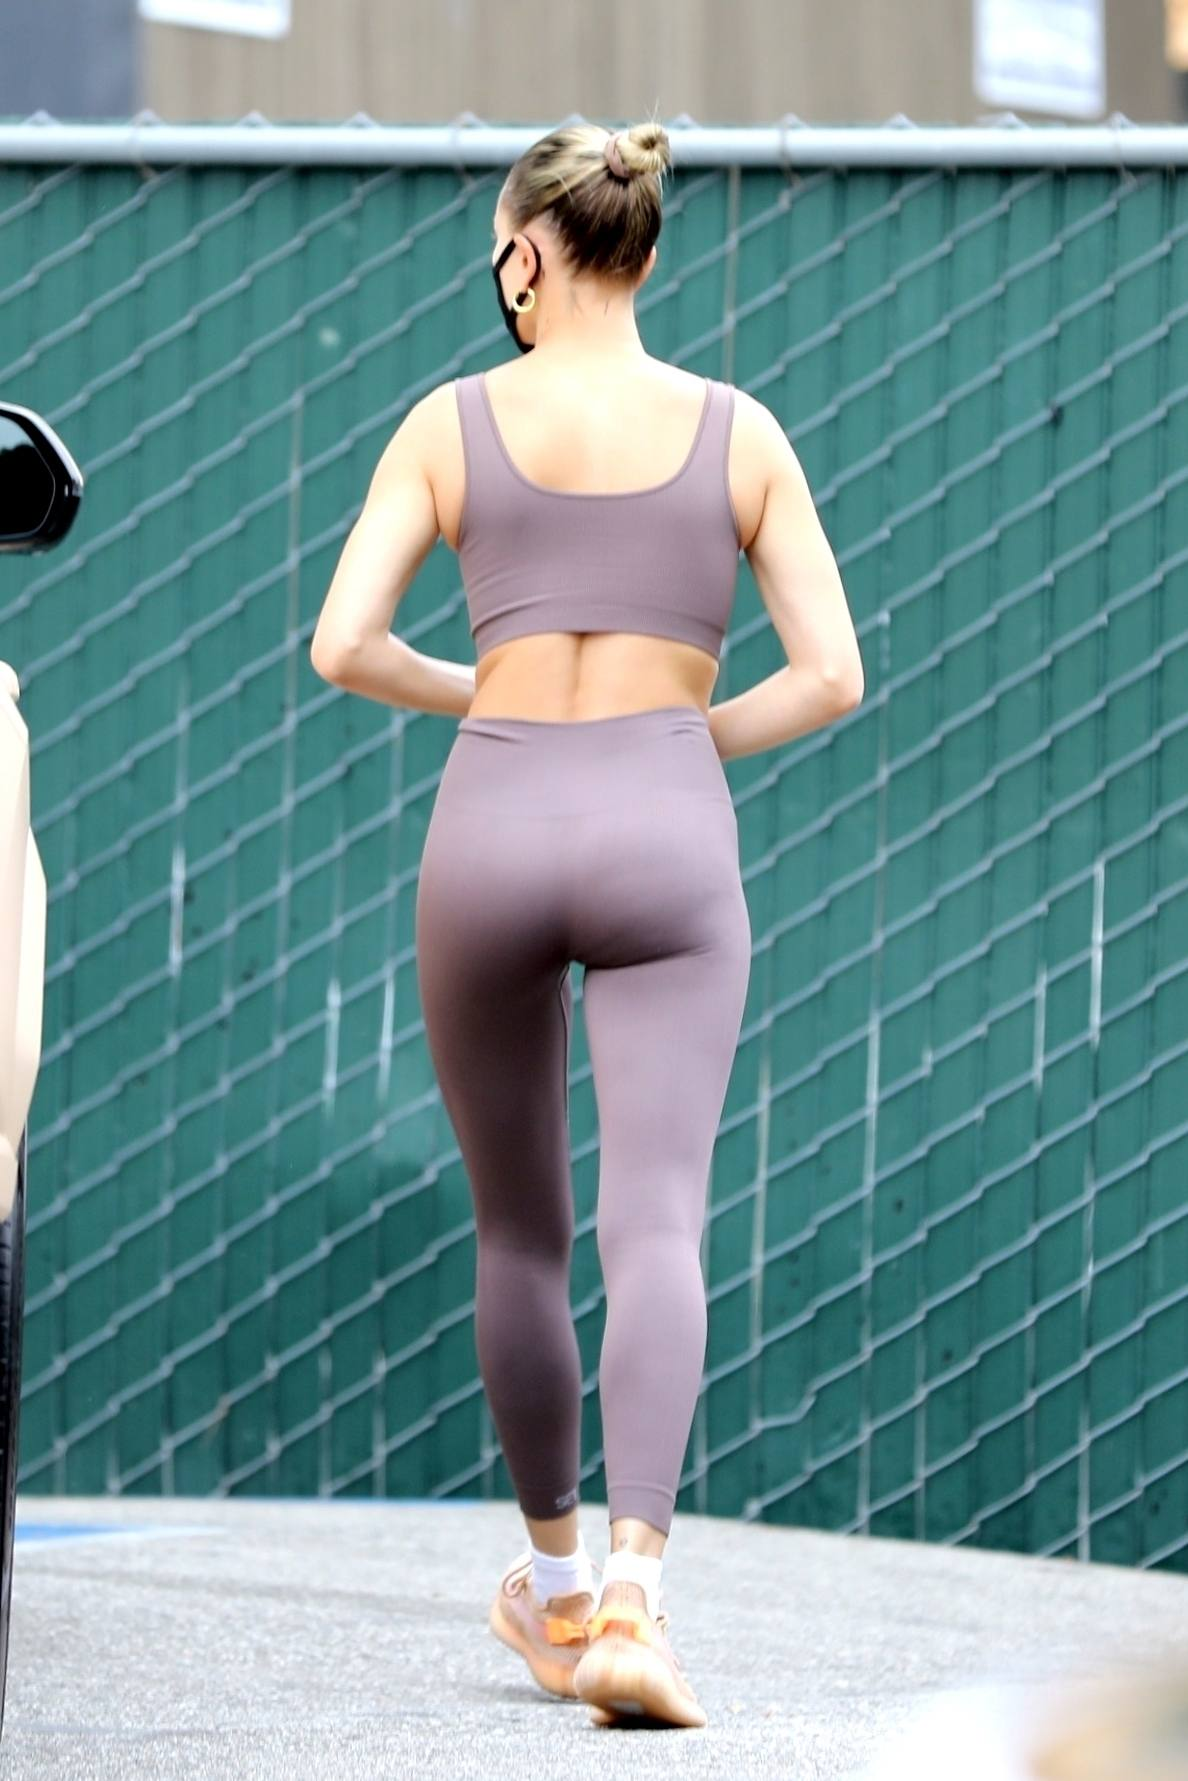 Hailey Baldwin – Beautiful Ass In Leggings Out In Los Angeles 0003